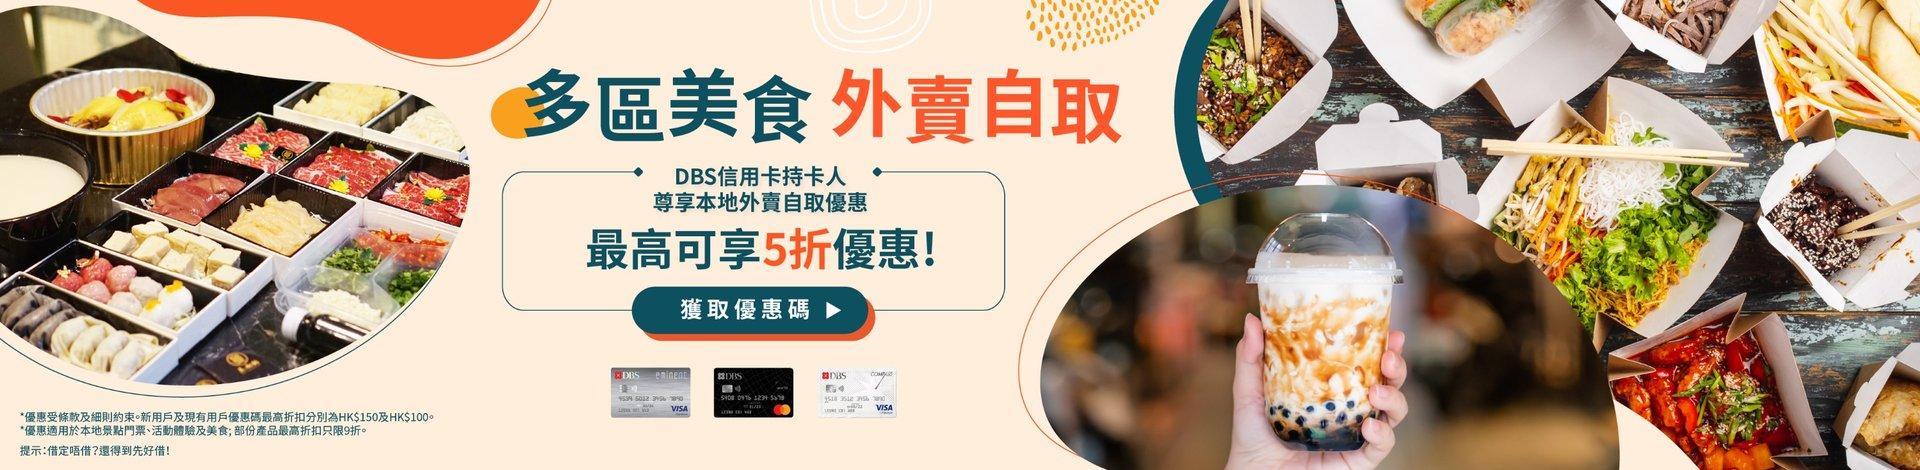 KLOOK客路旅行网站介绍及优惠码/折扣码/优惠券和使用方法 - 2020